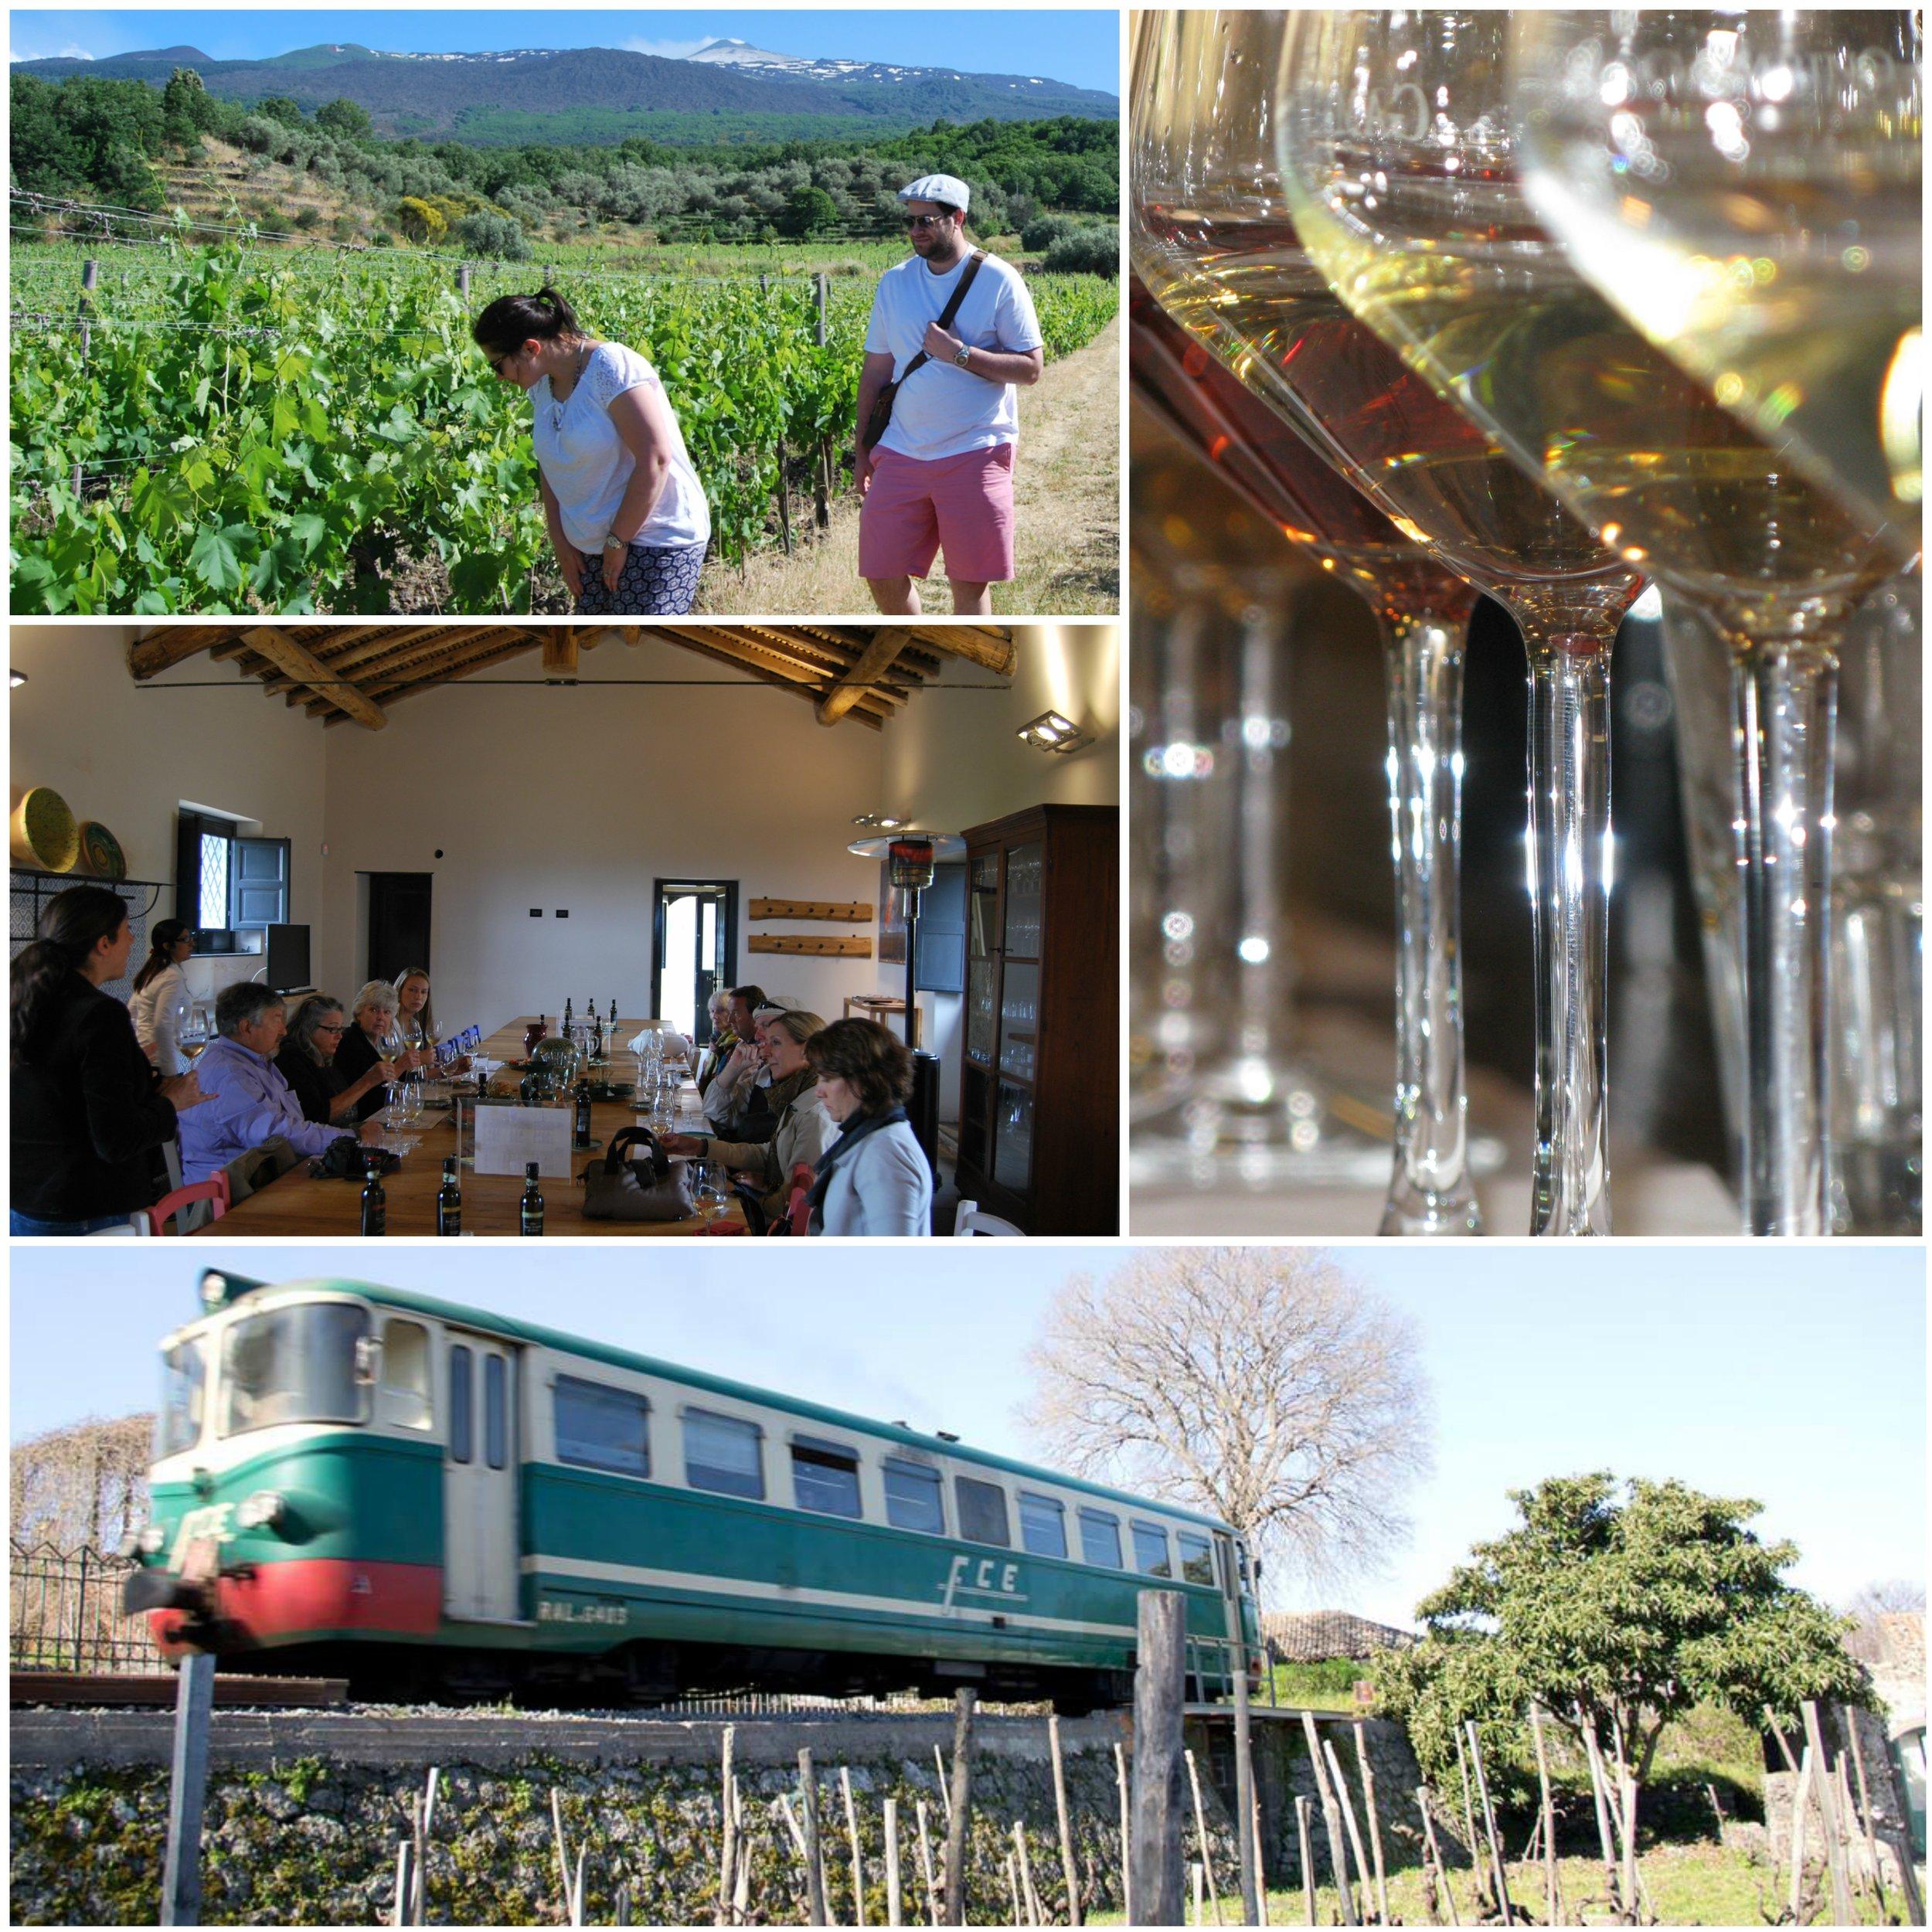 train-etna-wine_etna-wine-lab